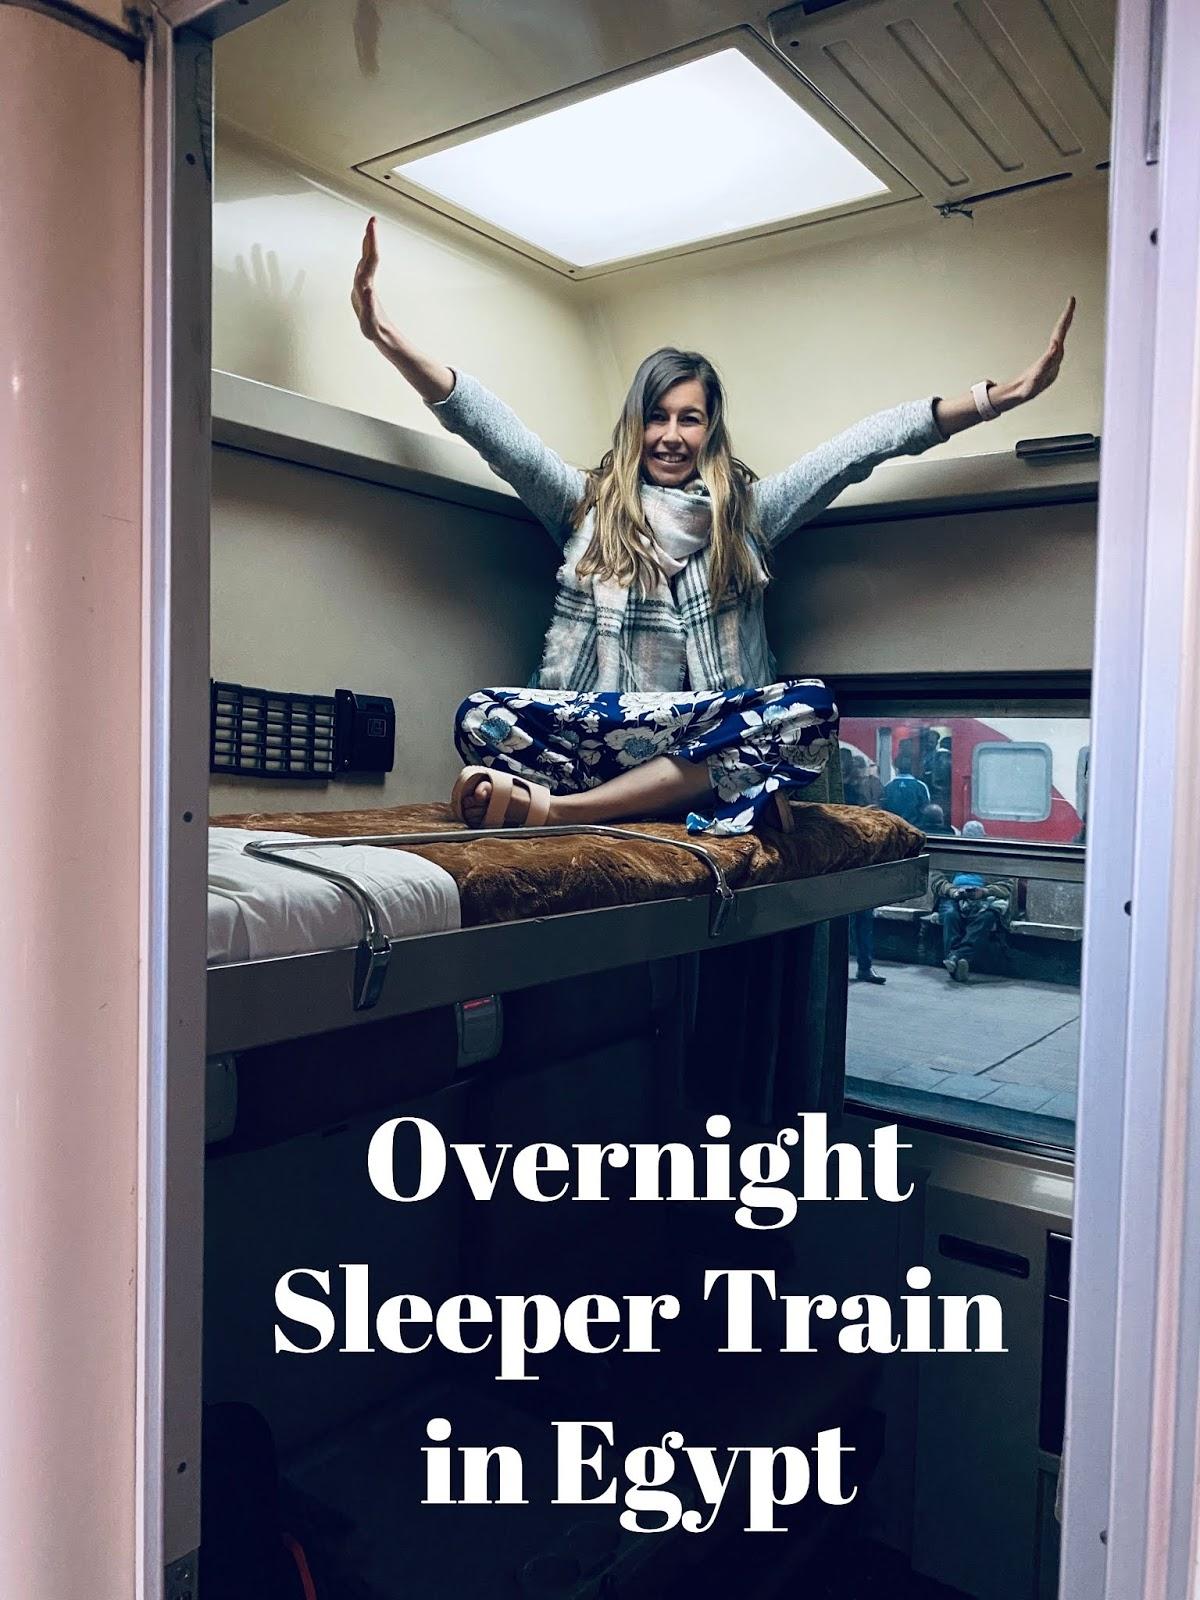 1st class sleeper train in egypt, egypt 1st train, egypt sleeper train, egypt train, sleeper train, taking the overnight sleeper train in Egypt,